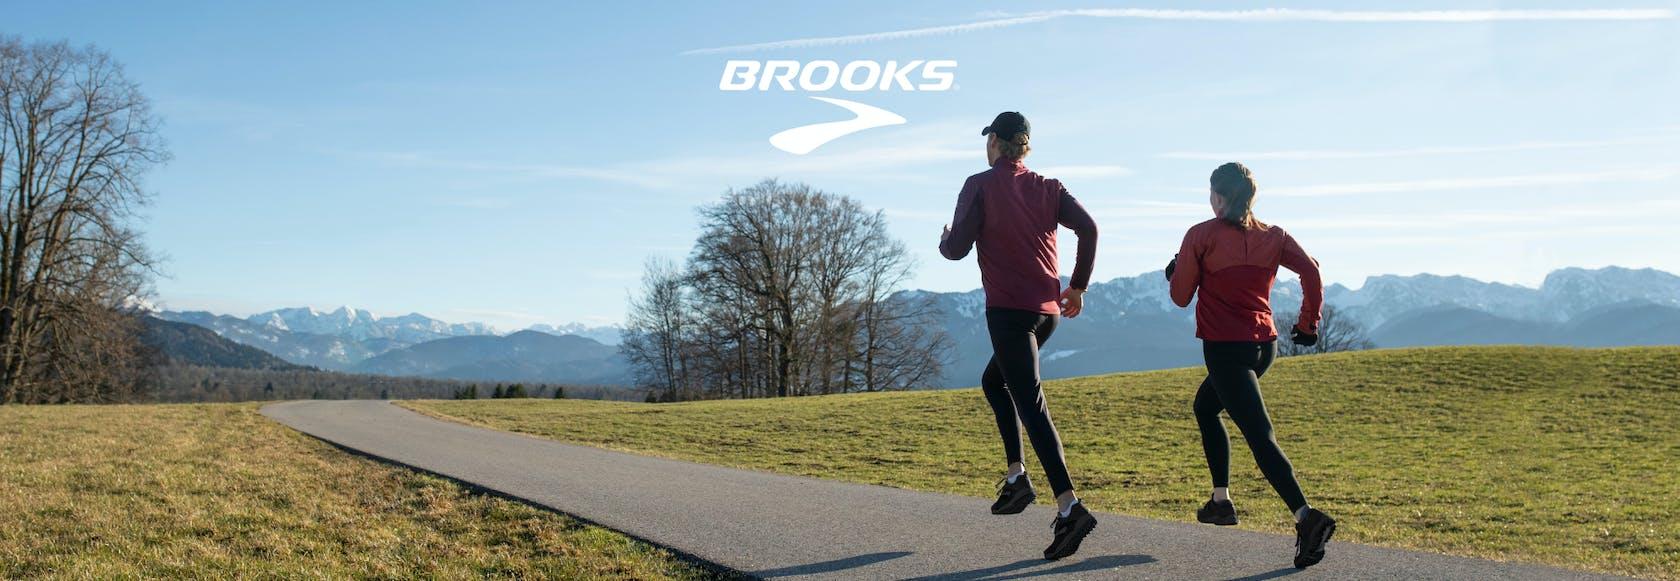 Brooks shop online